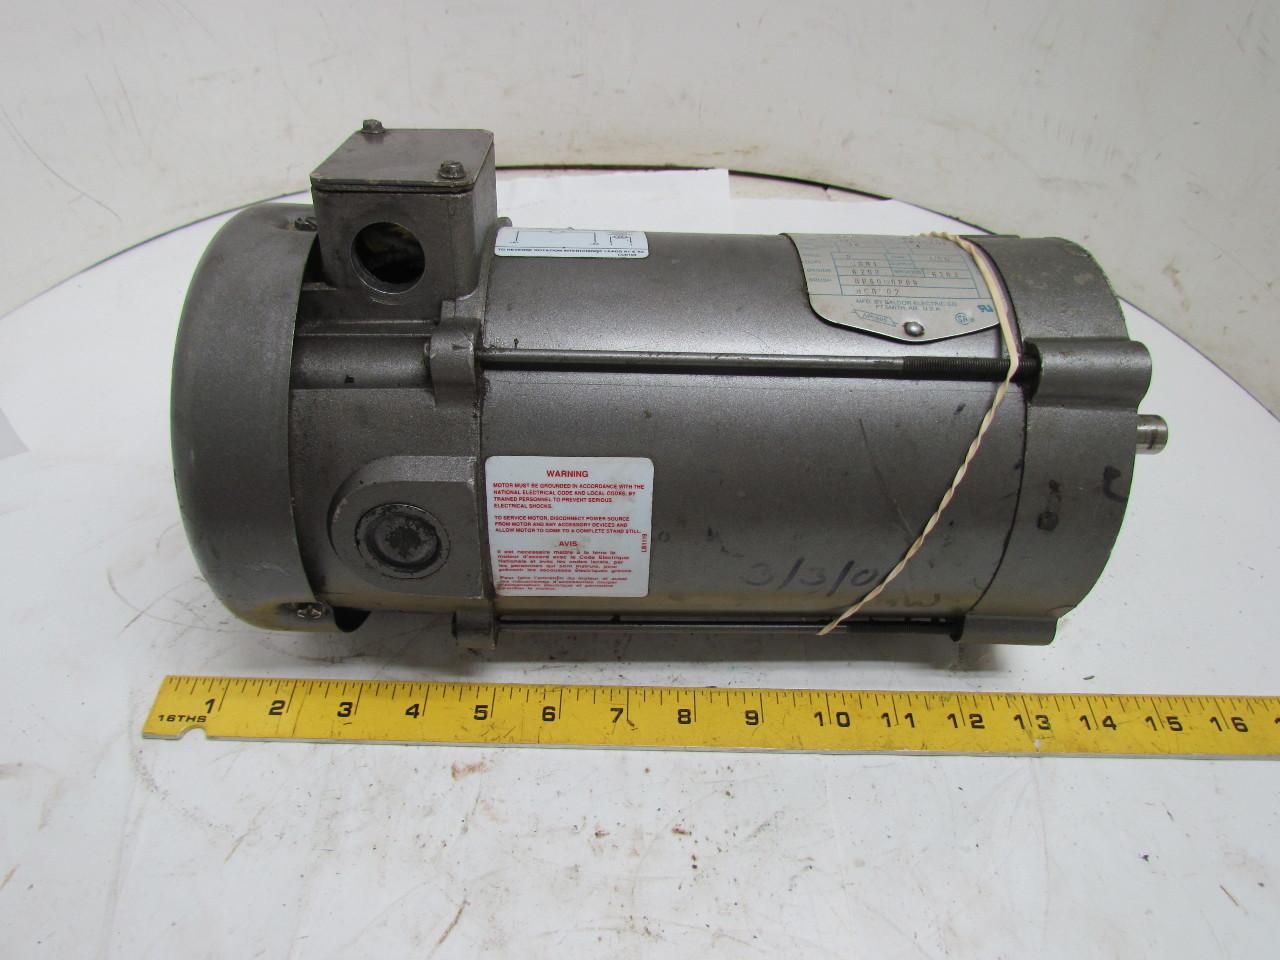 Emerson 34 6220 3674 1 2 Hp Dc Motor 90v 1750 Rpm 56c